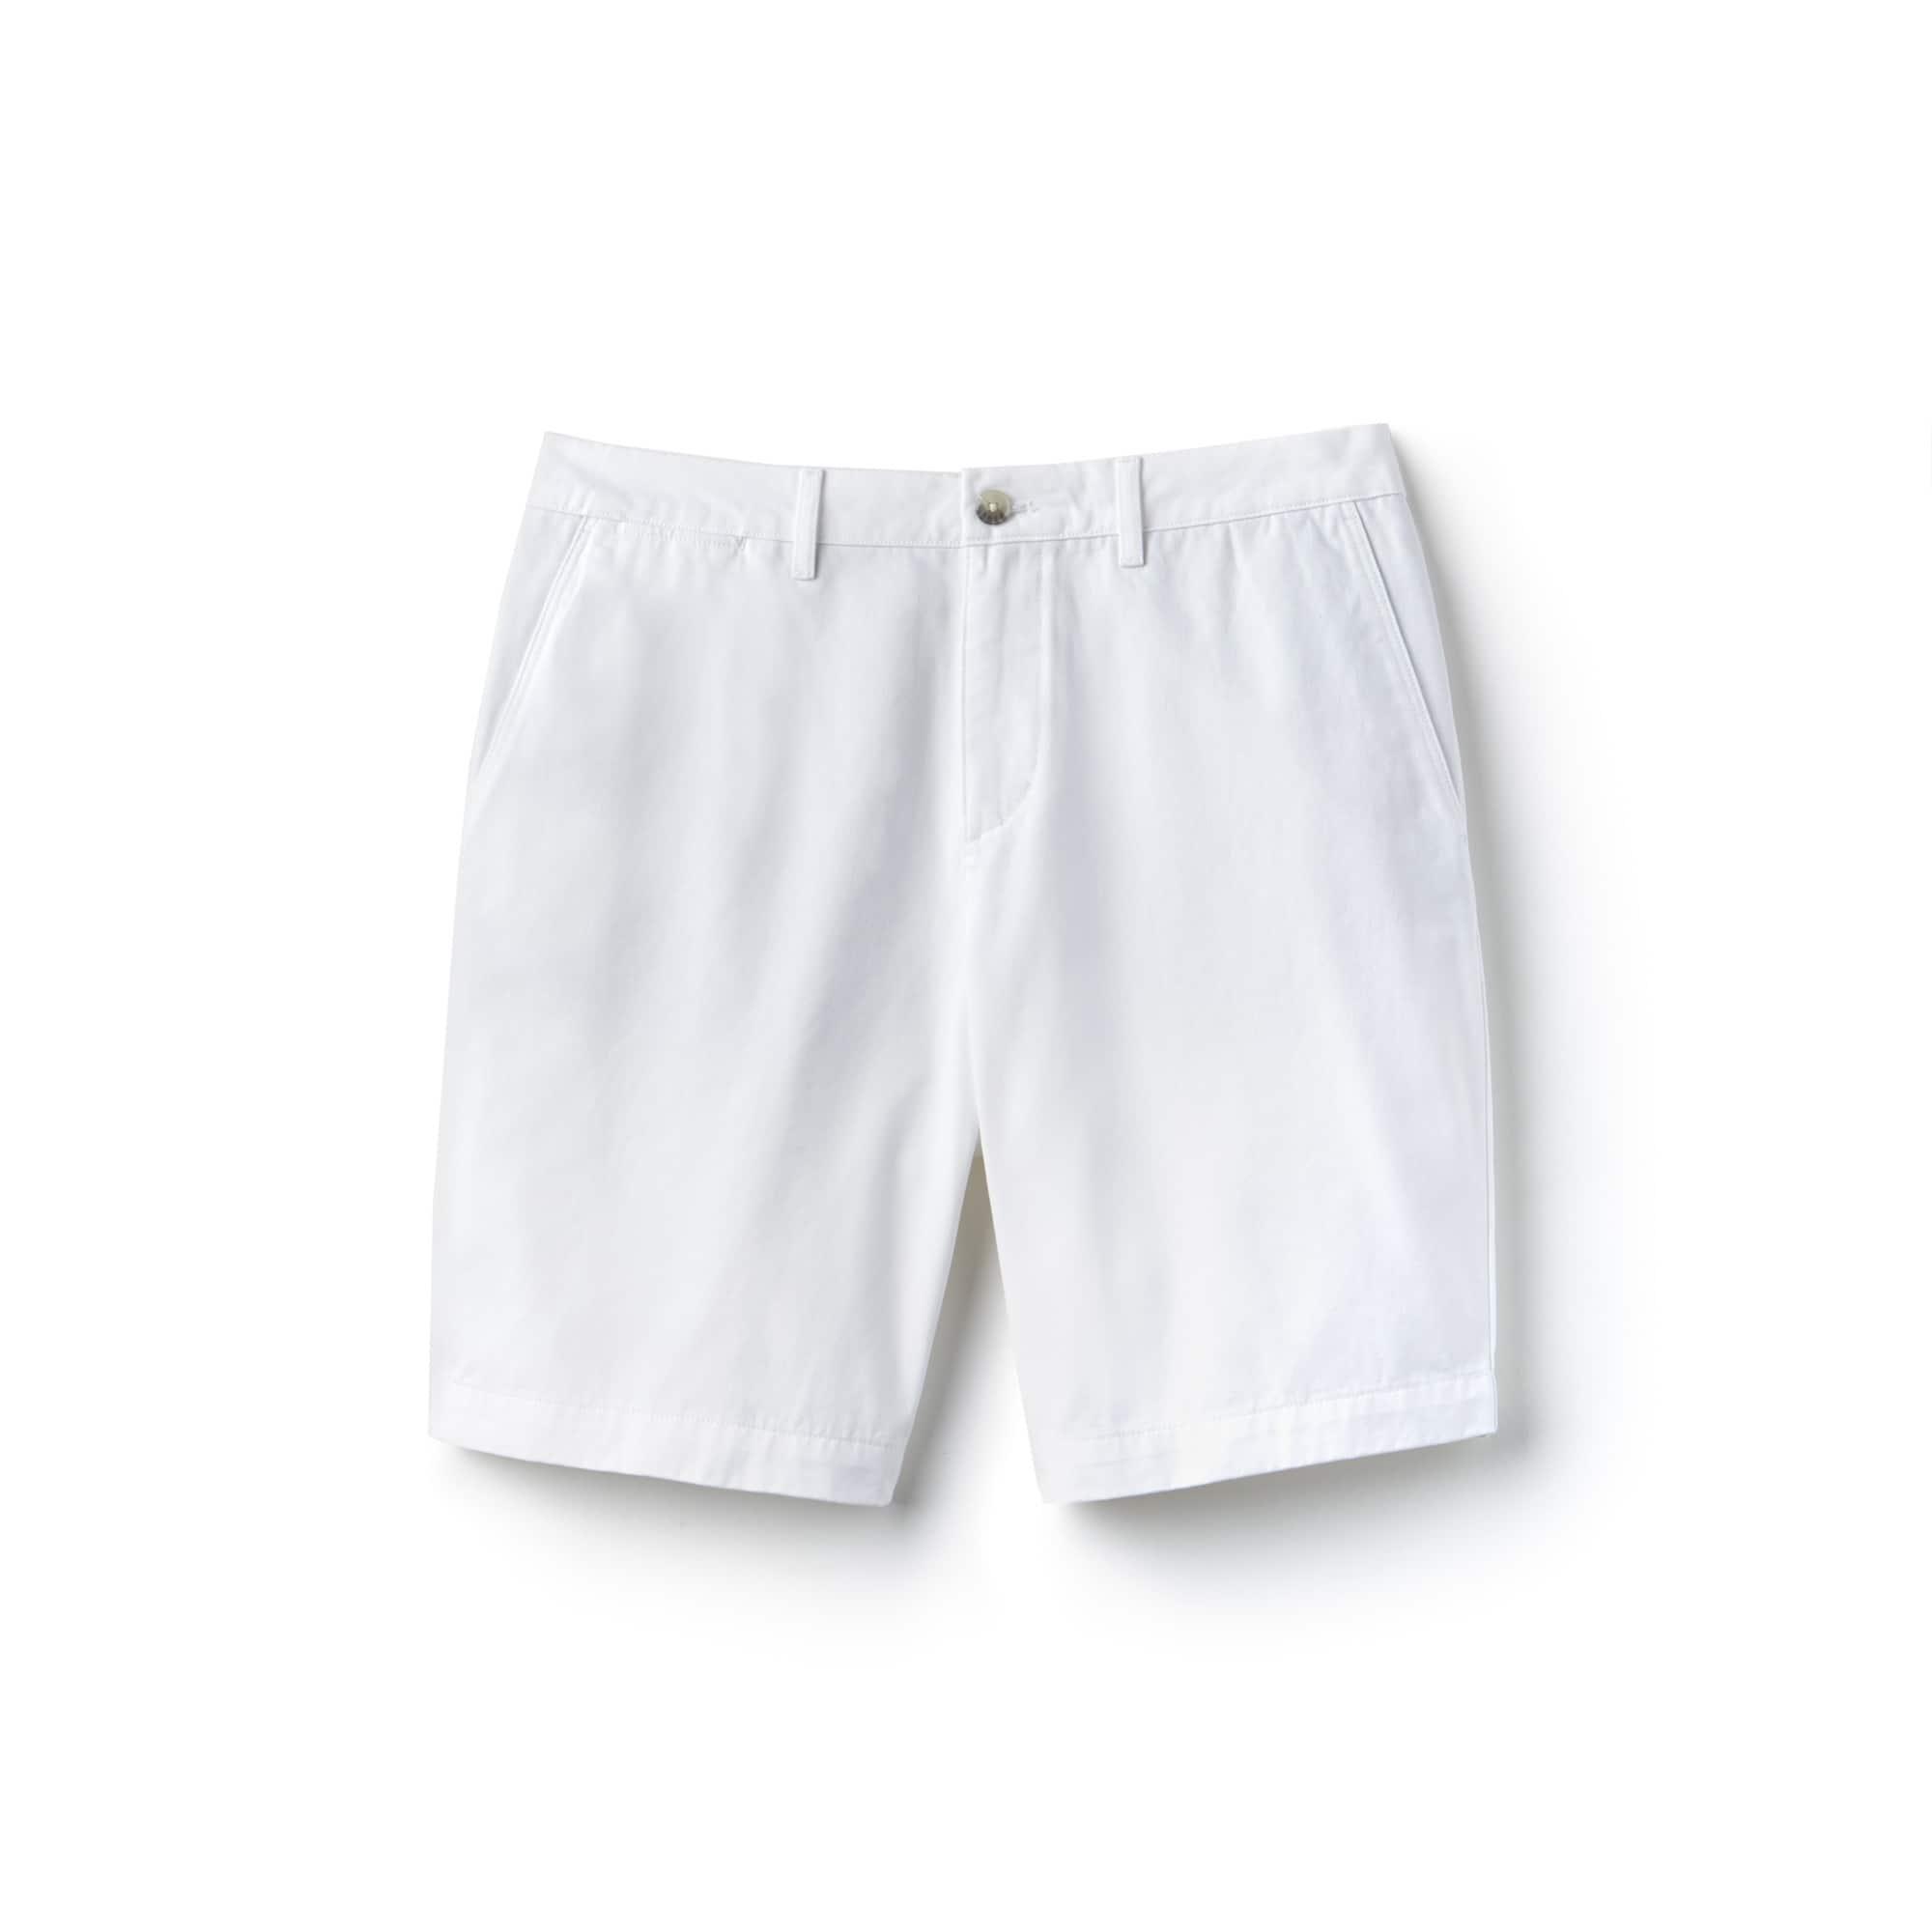 Bermudas regular fit de gabardina de algodón liso